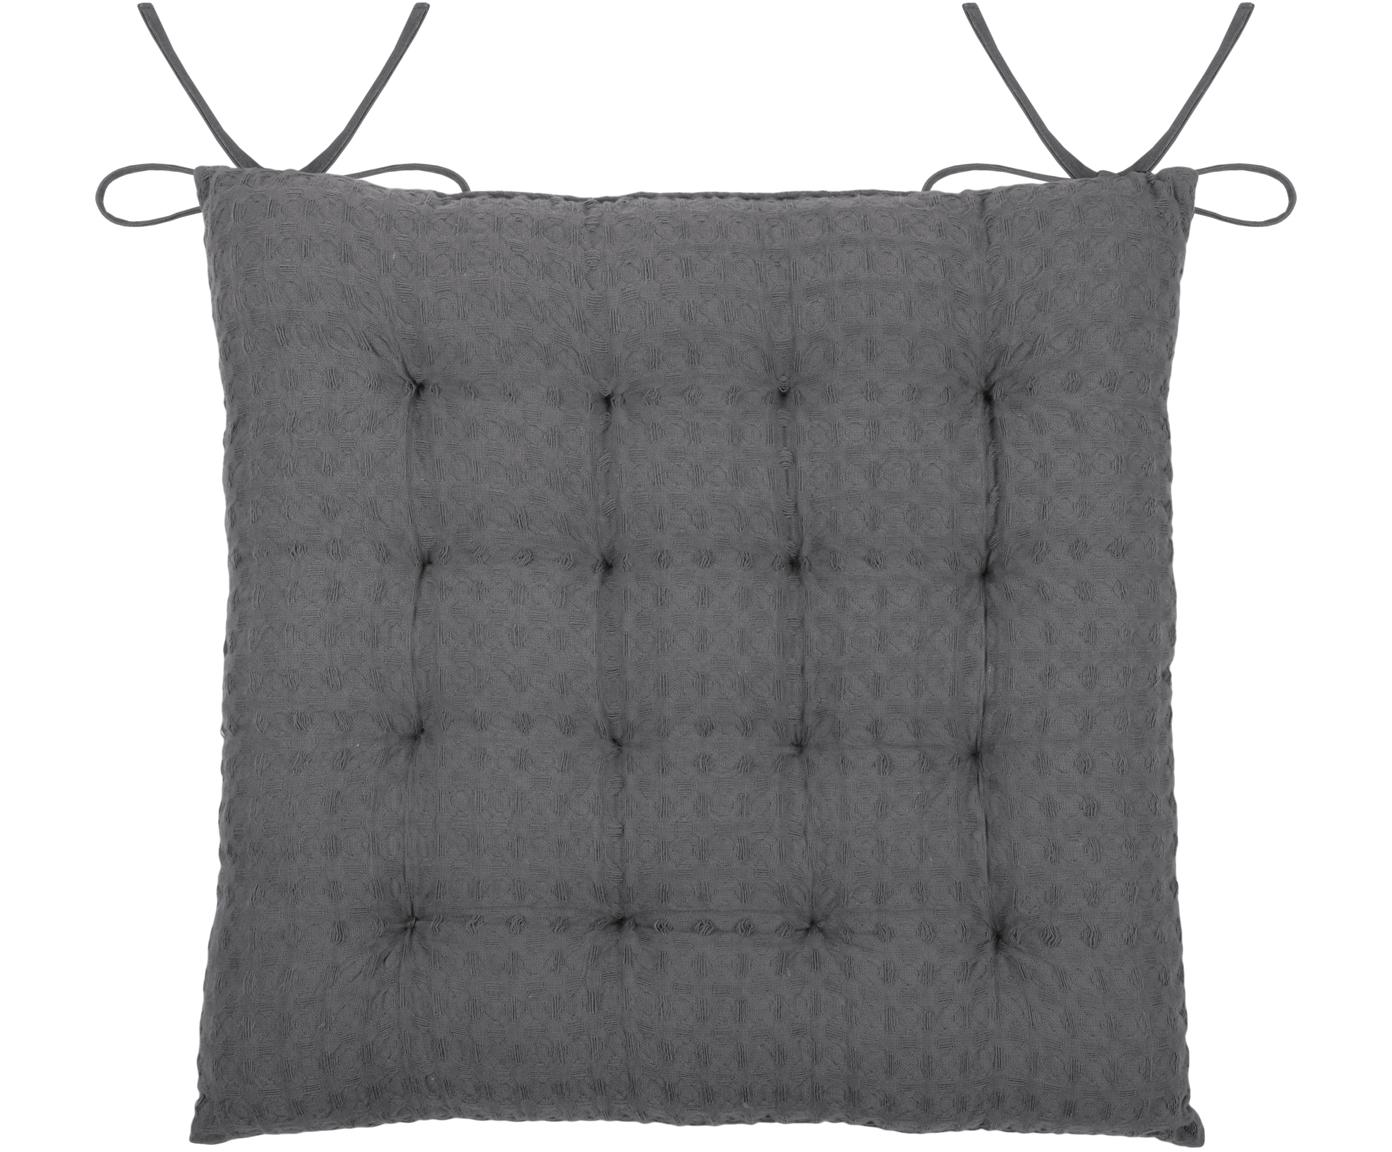 Waffelpiqué-Sitzkissen Gopher in Dunkelgrau, Bezug: 100% Baumwolle, Dunkelgrau, 40 x 40 cm